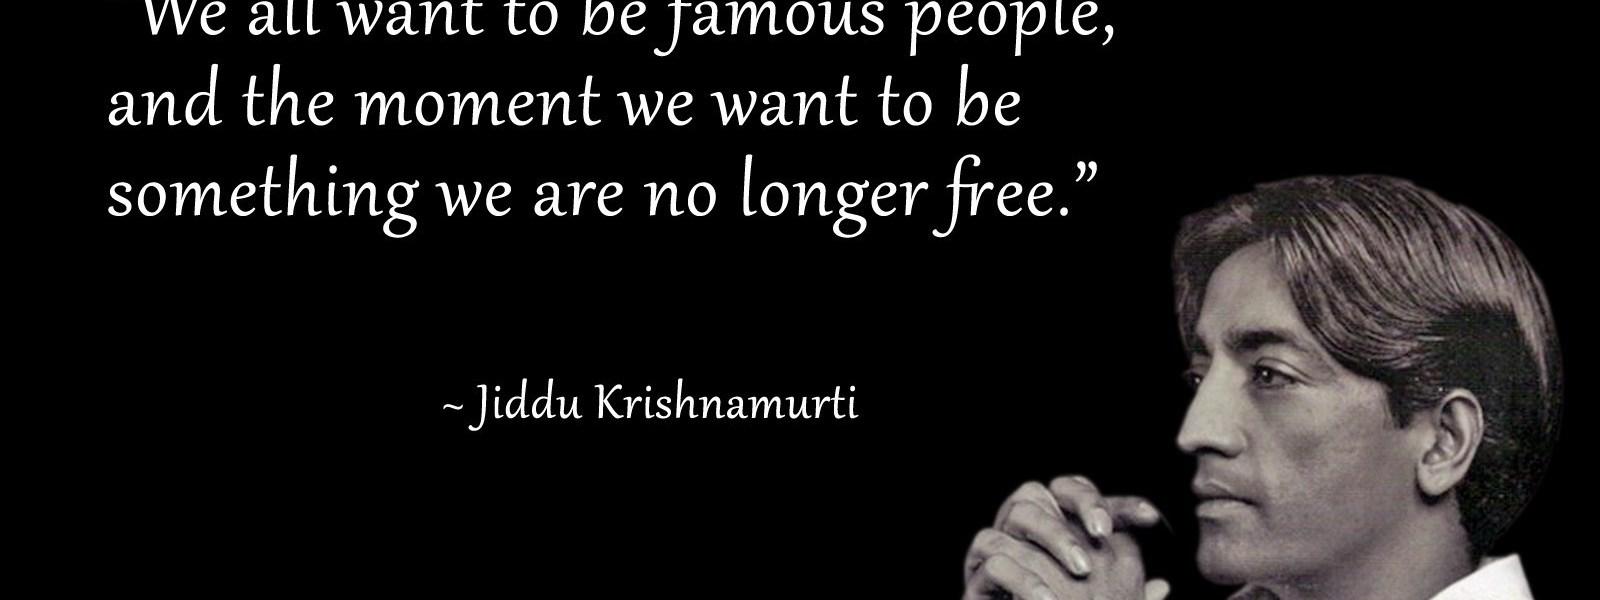 J. Krishnamurti Quotes on Life